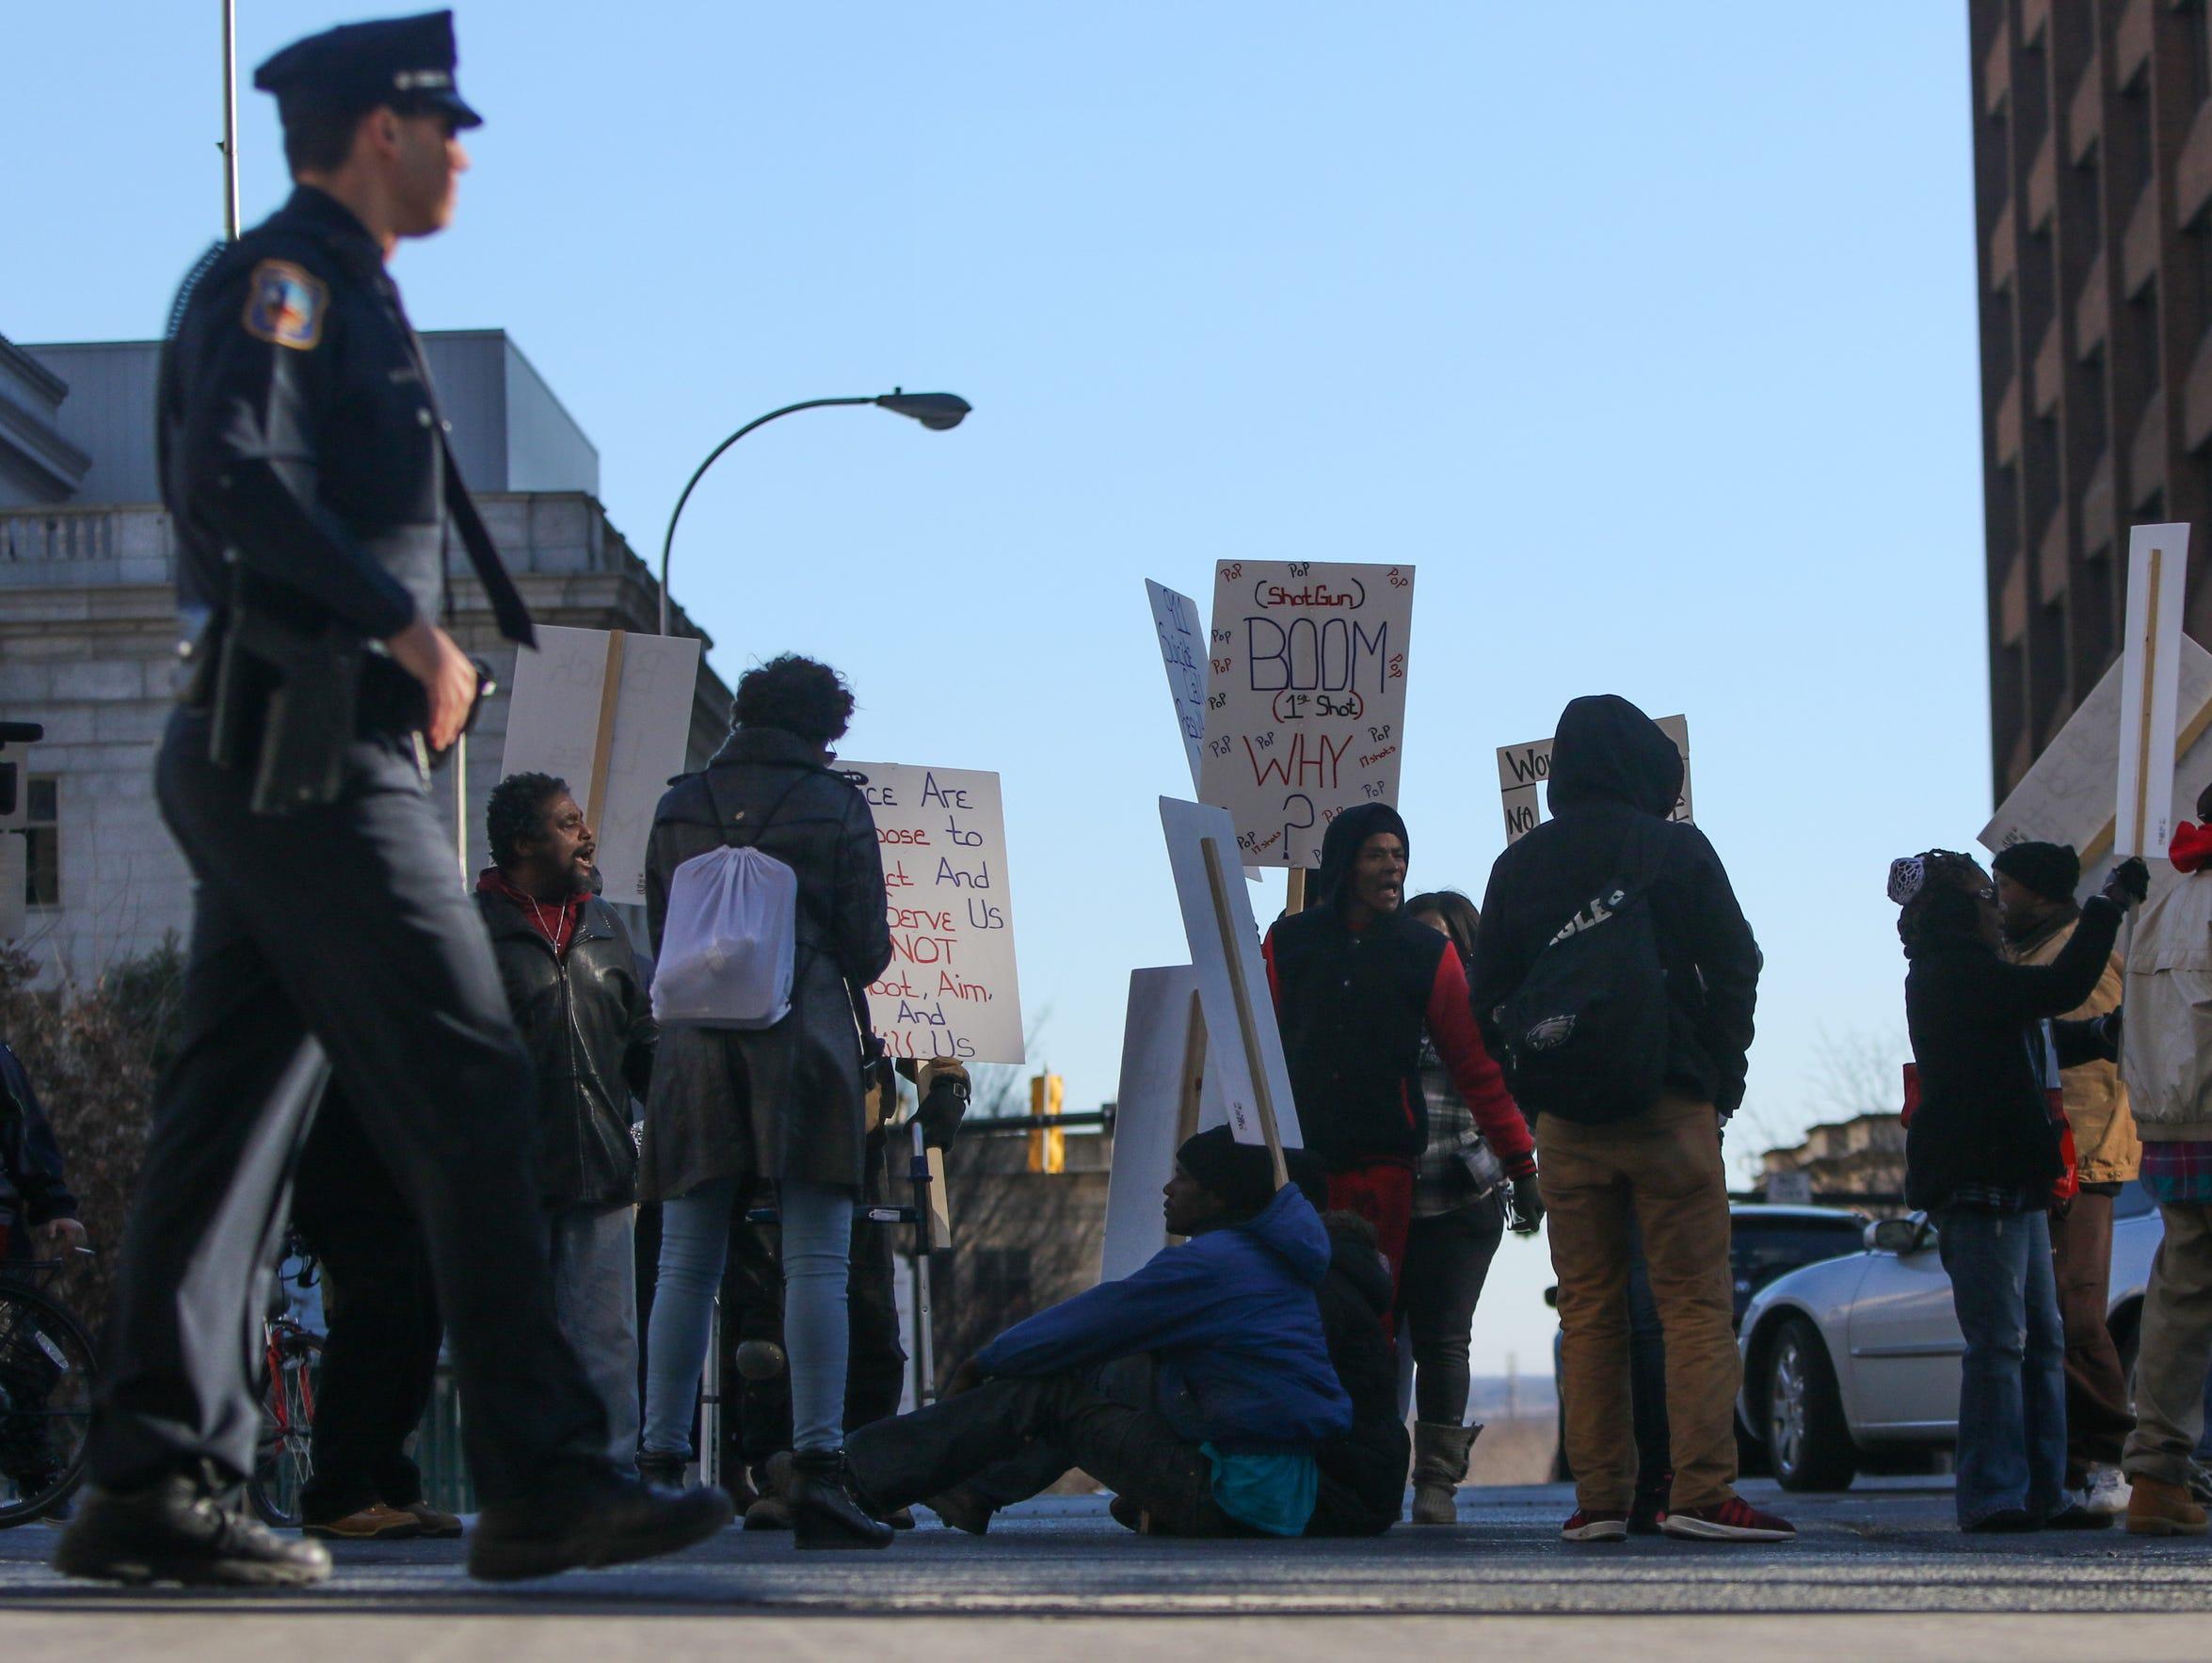 McDole protestors shut down the intersection of Market